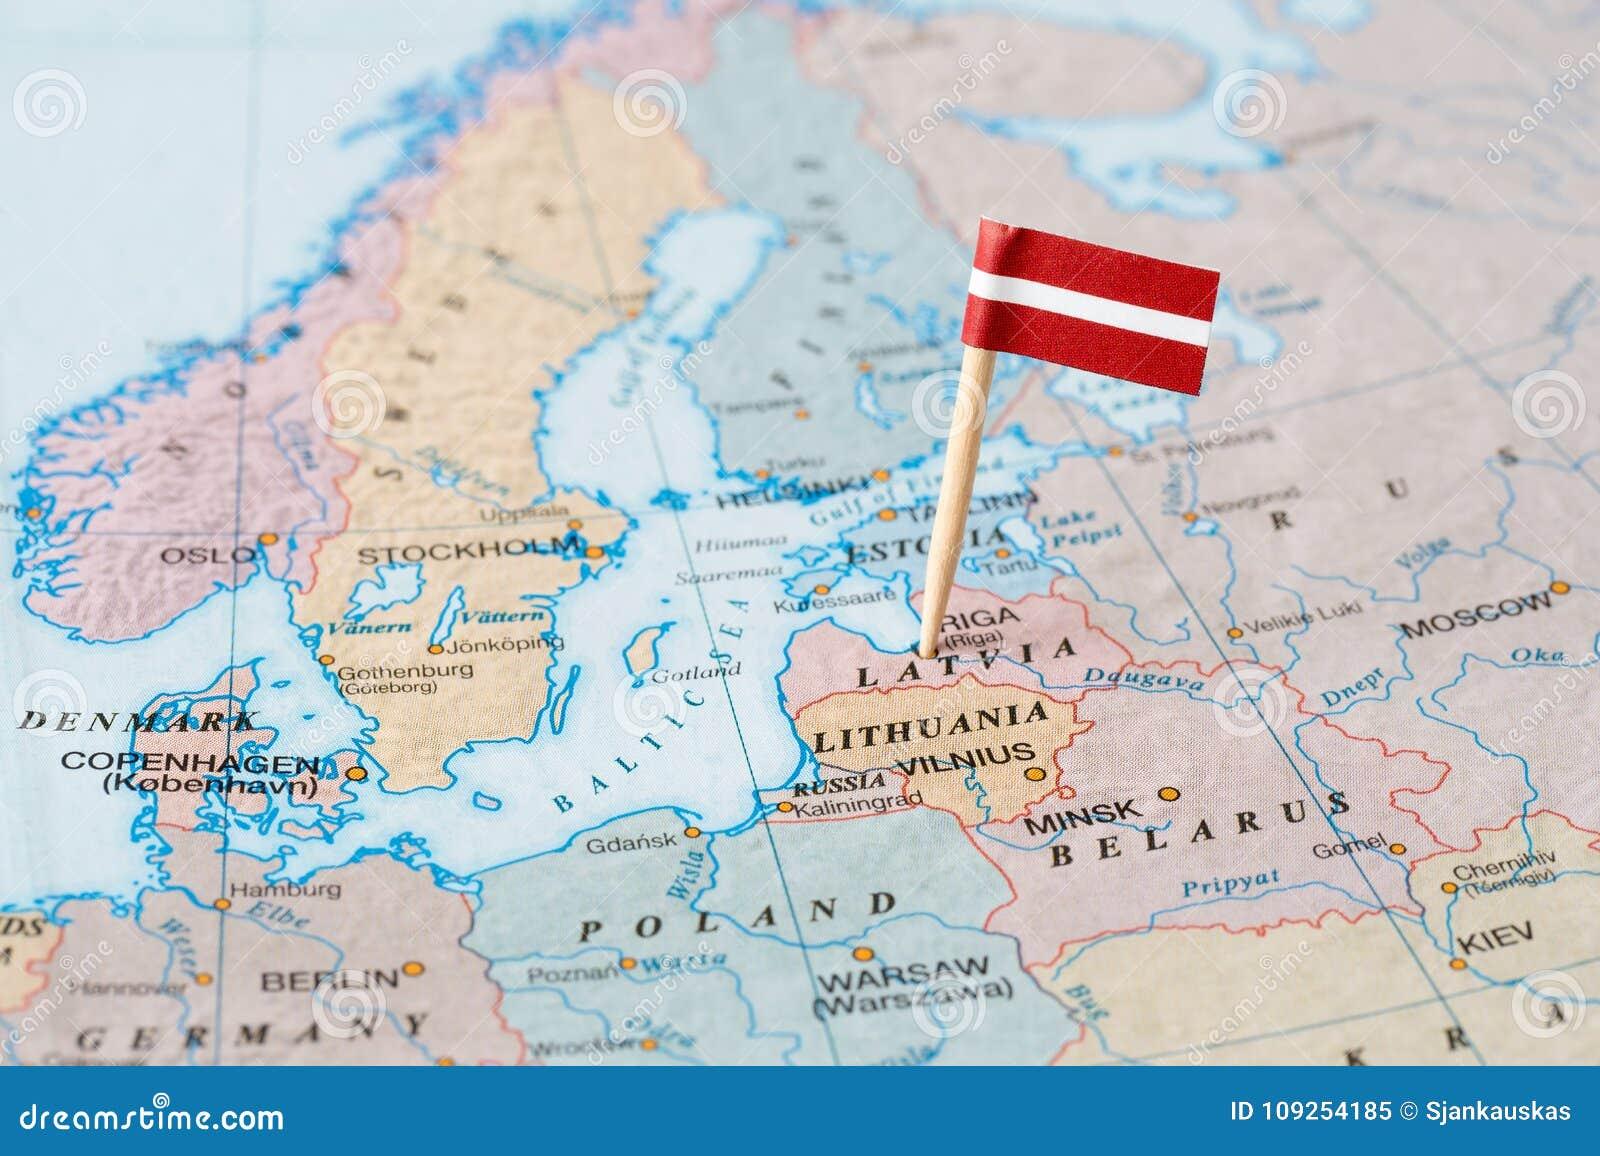 Mapa Politico Letonia Con Un Capital De Riga Ilustraciones